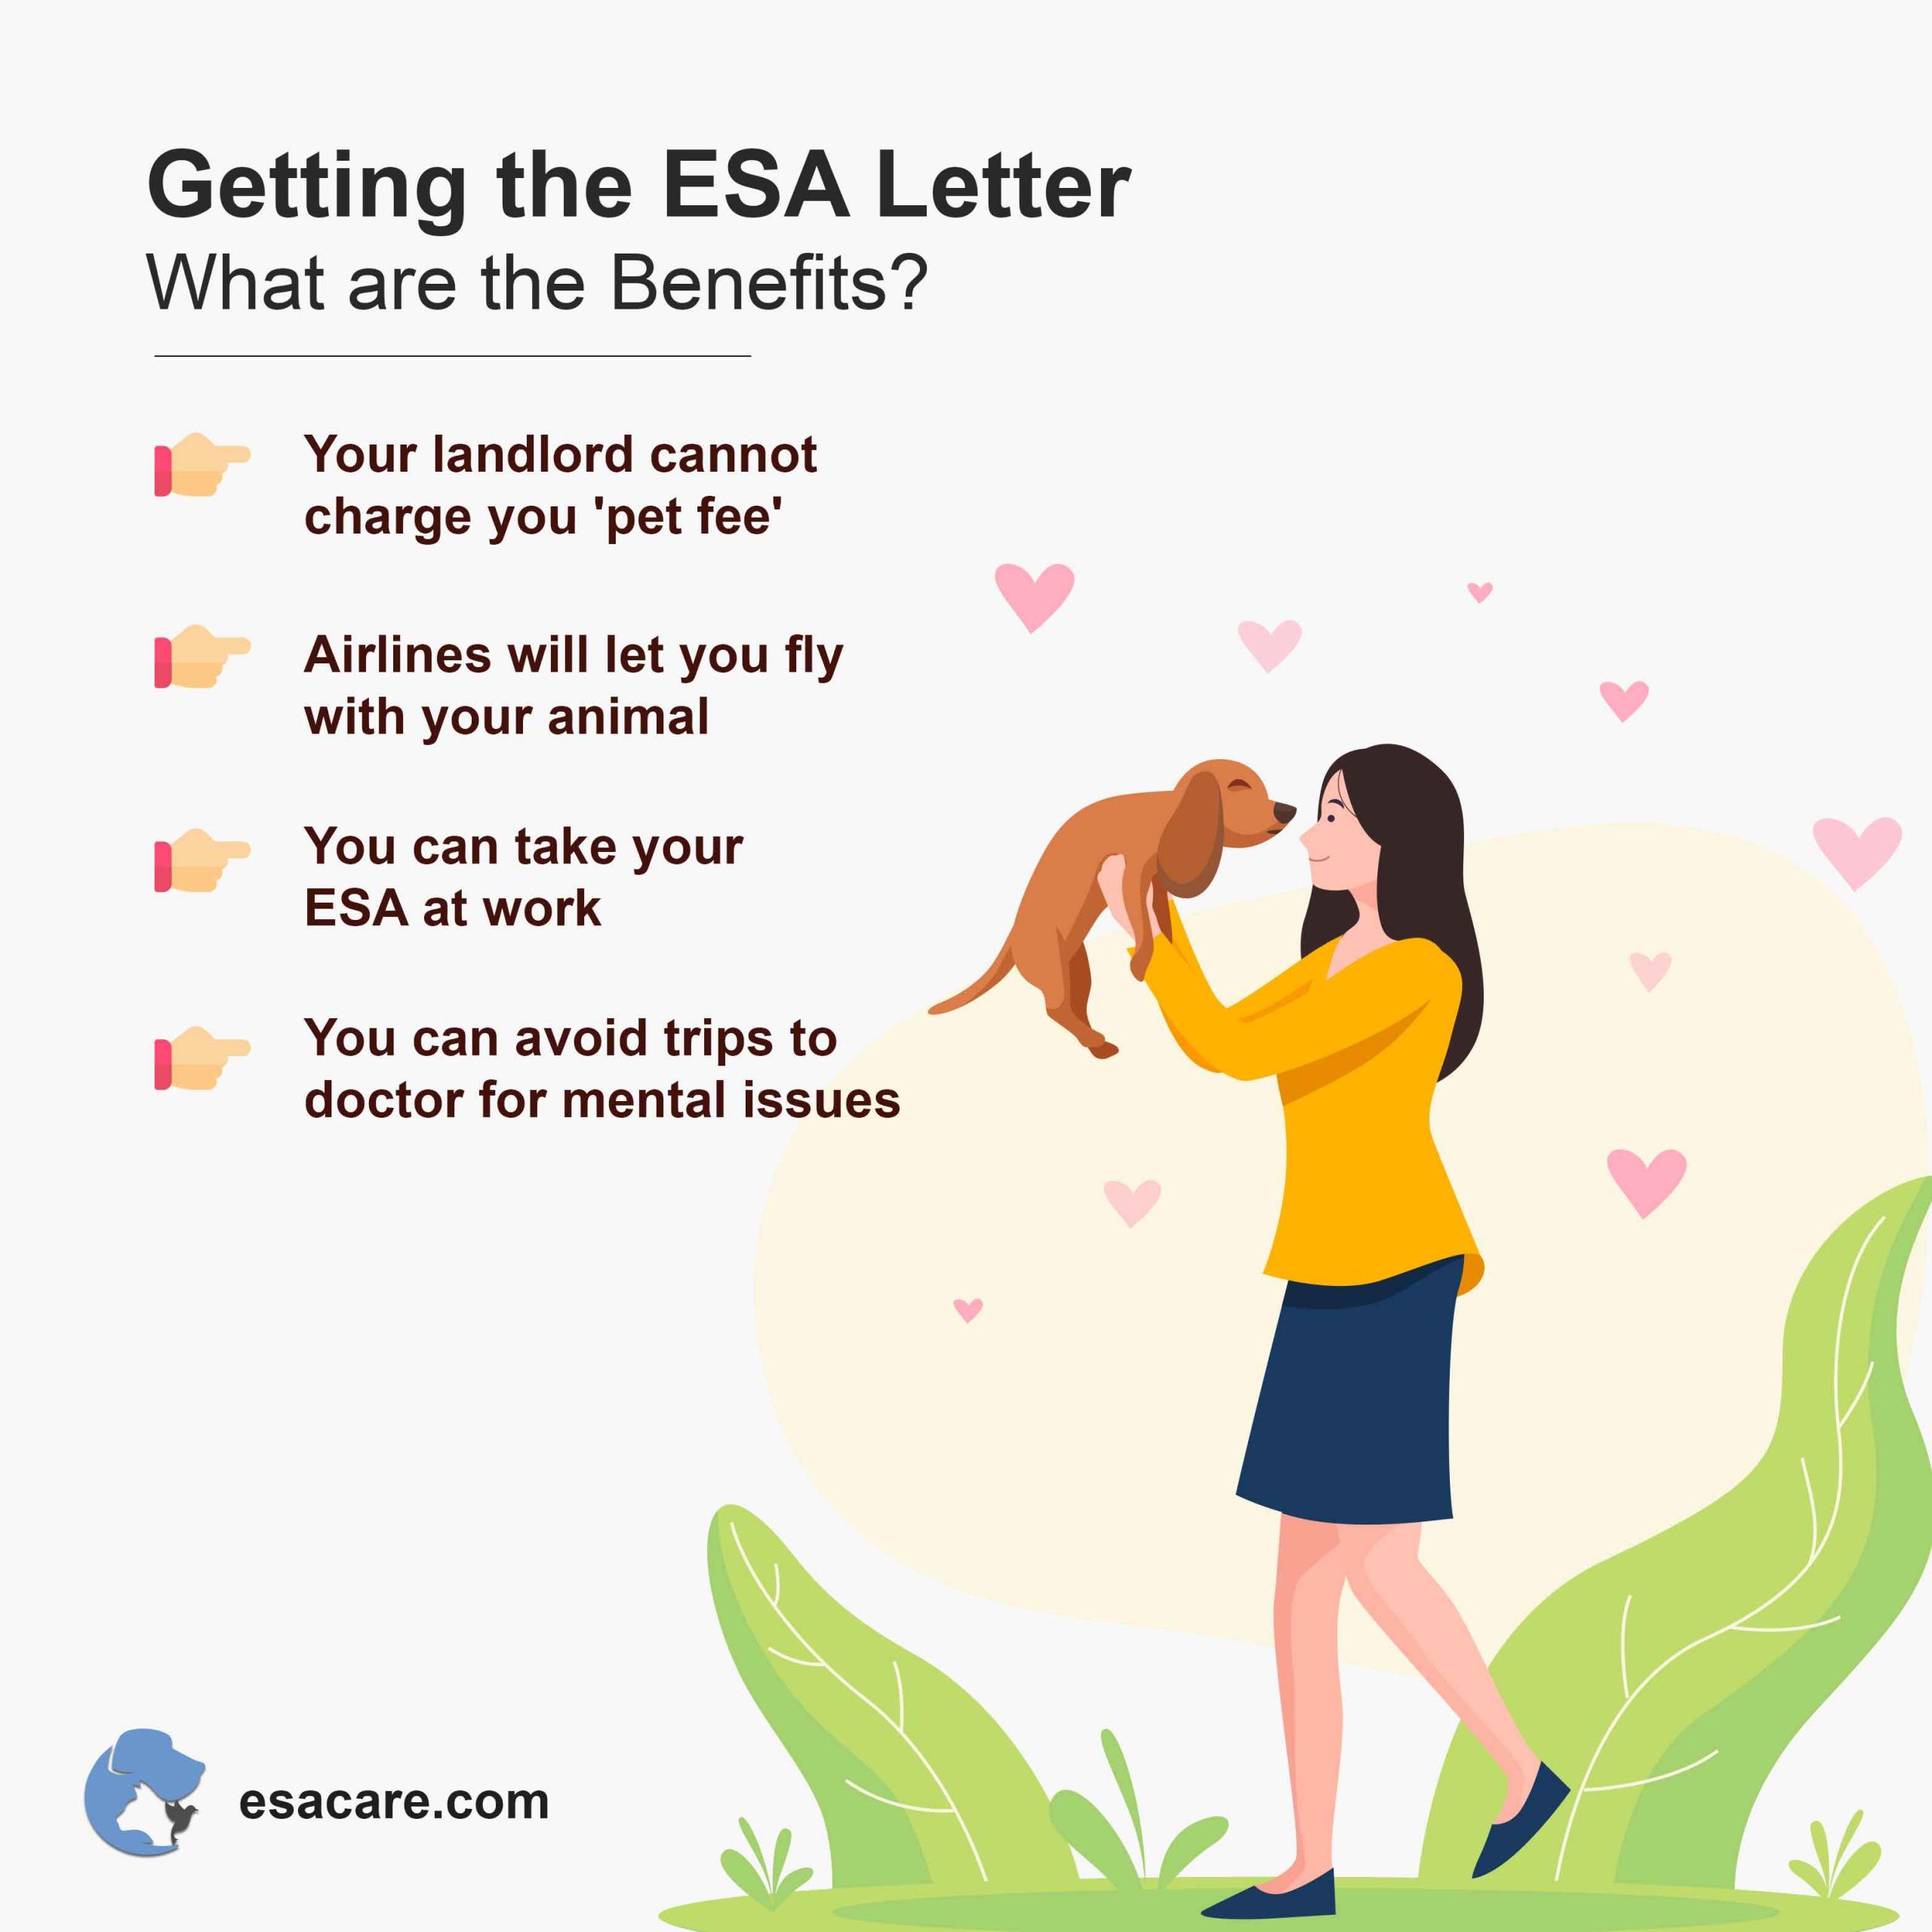 ESA letter benefits